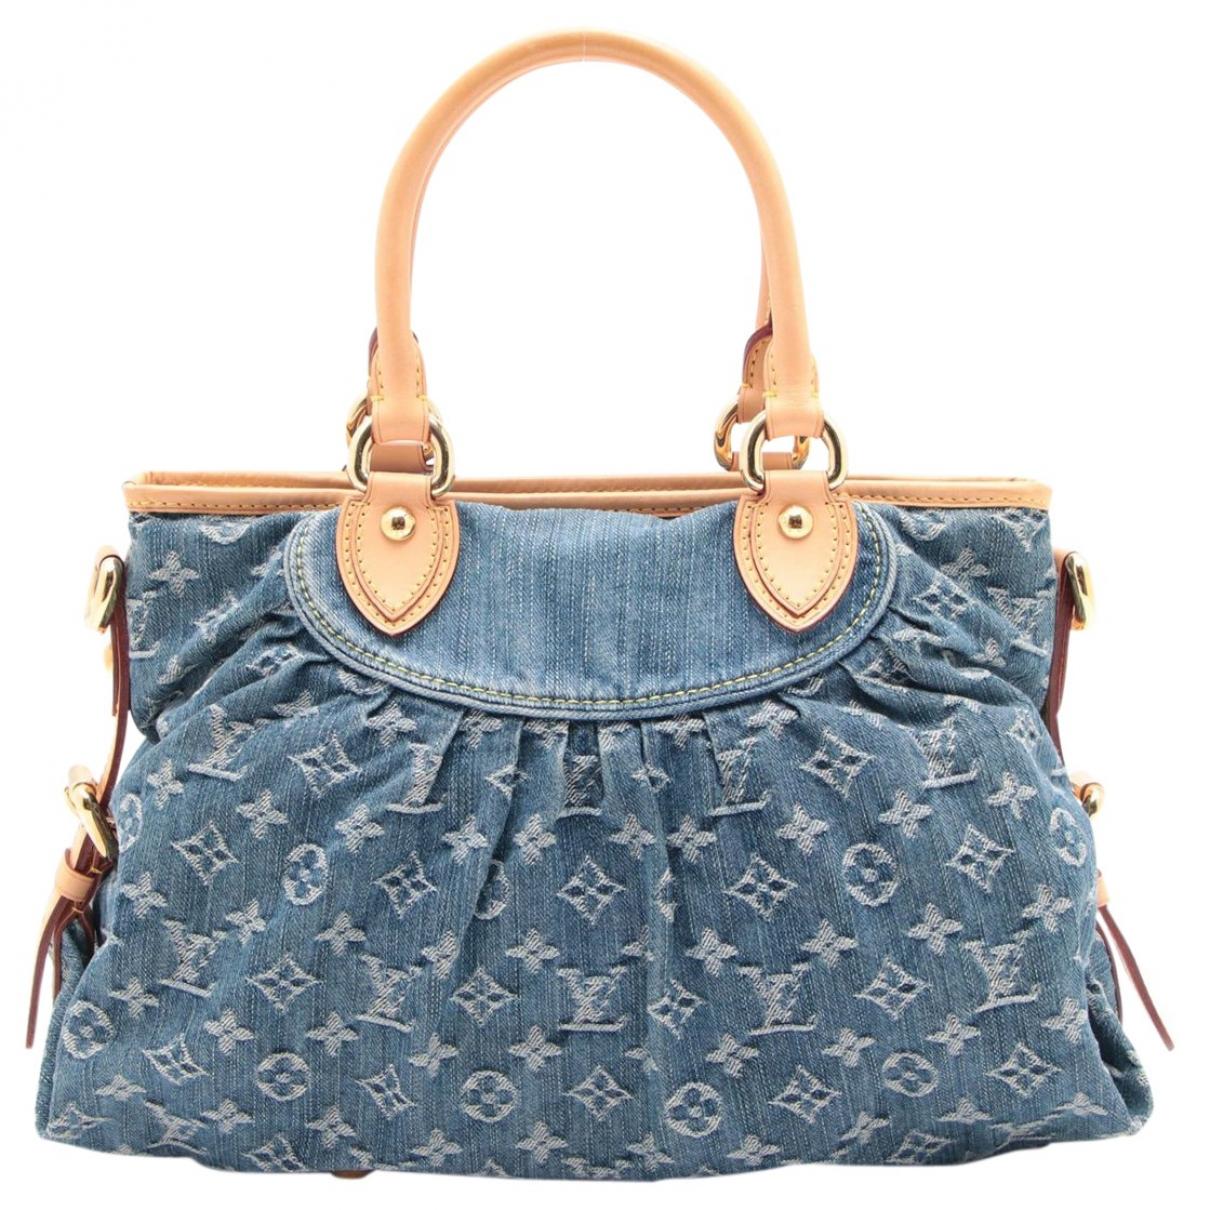 Louis Vuitton - Sac a main   pour femme en denim - bleu